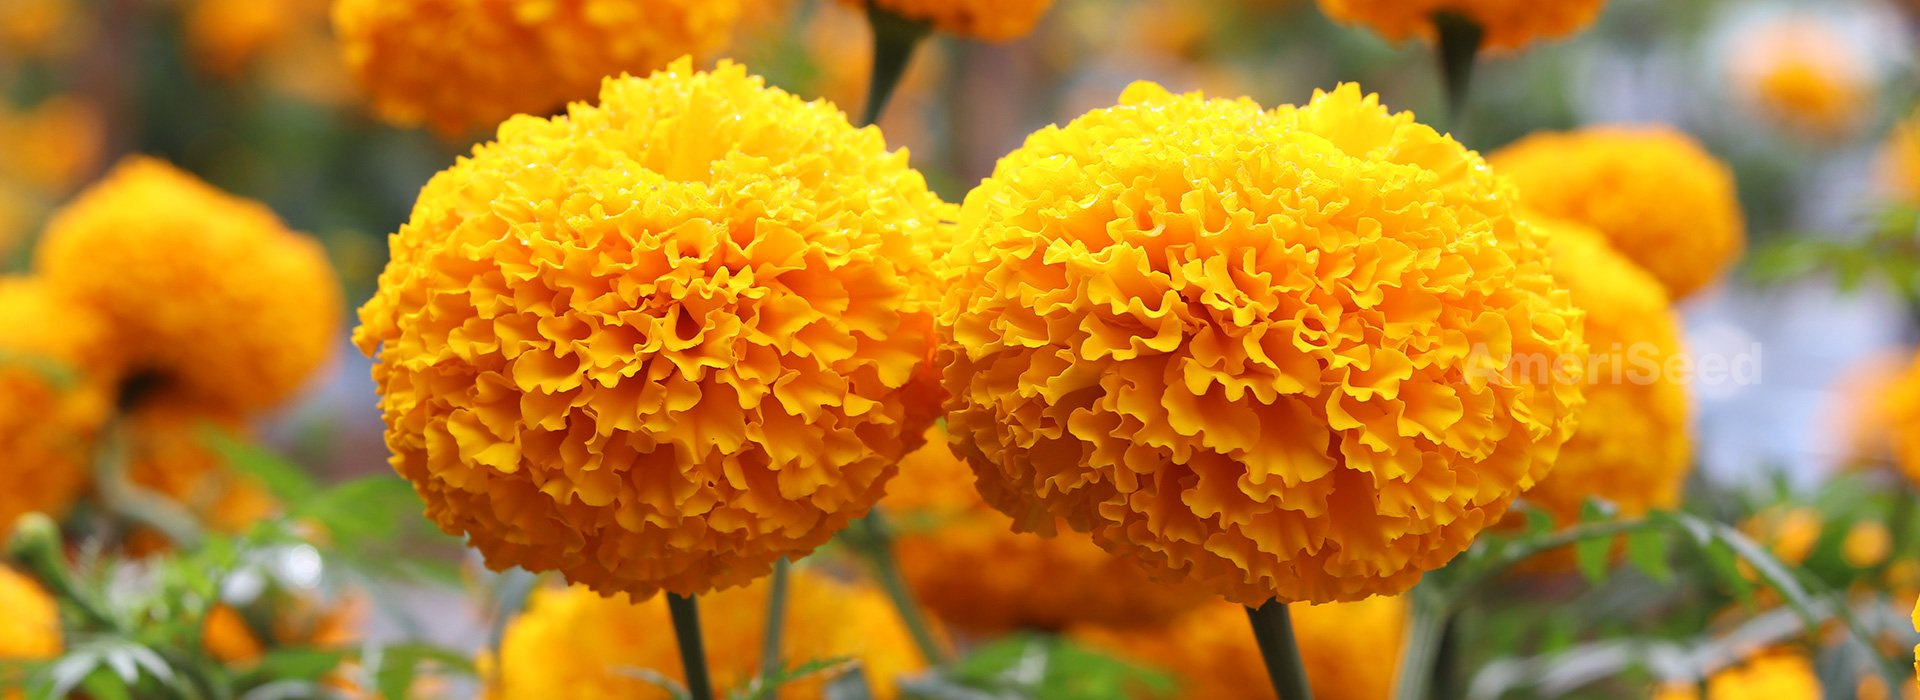 American Marigold